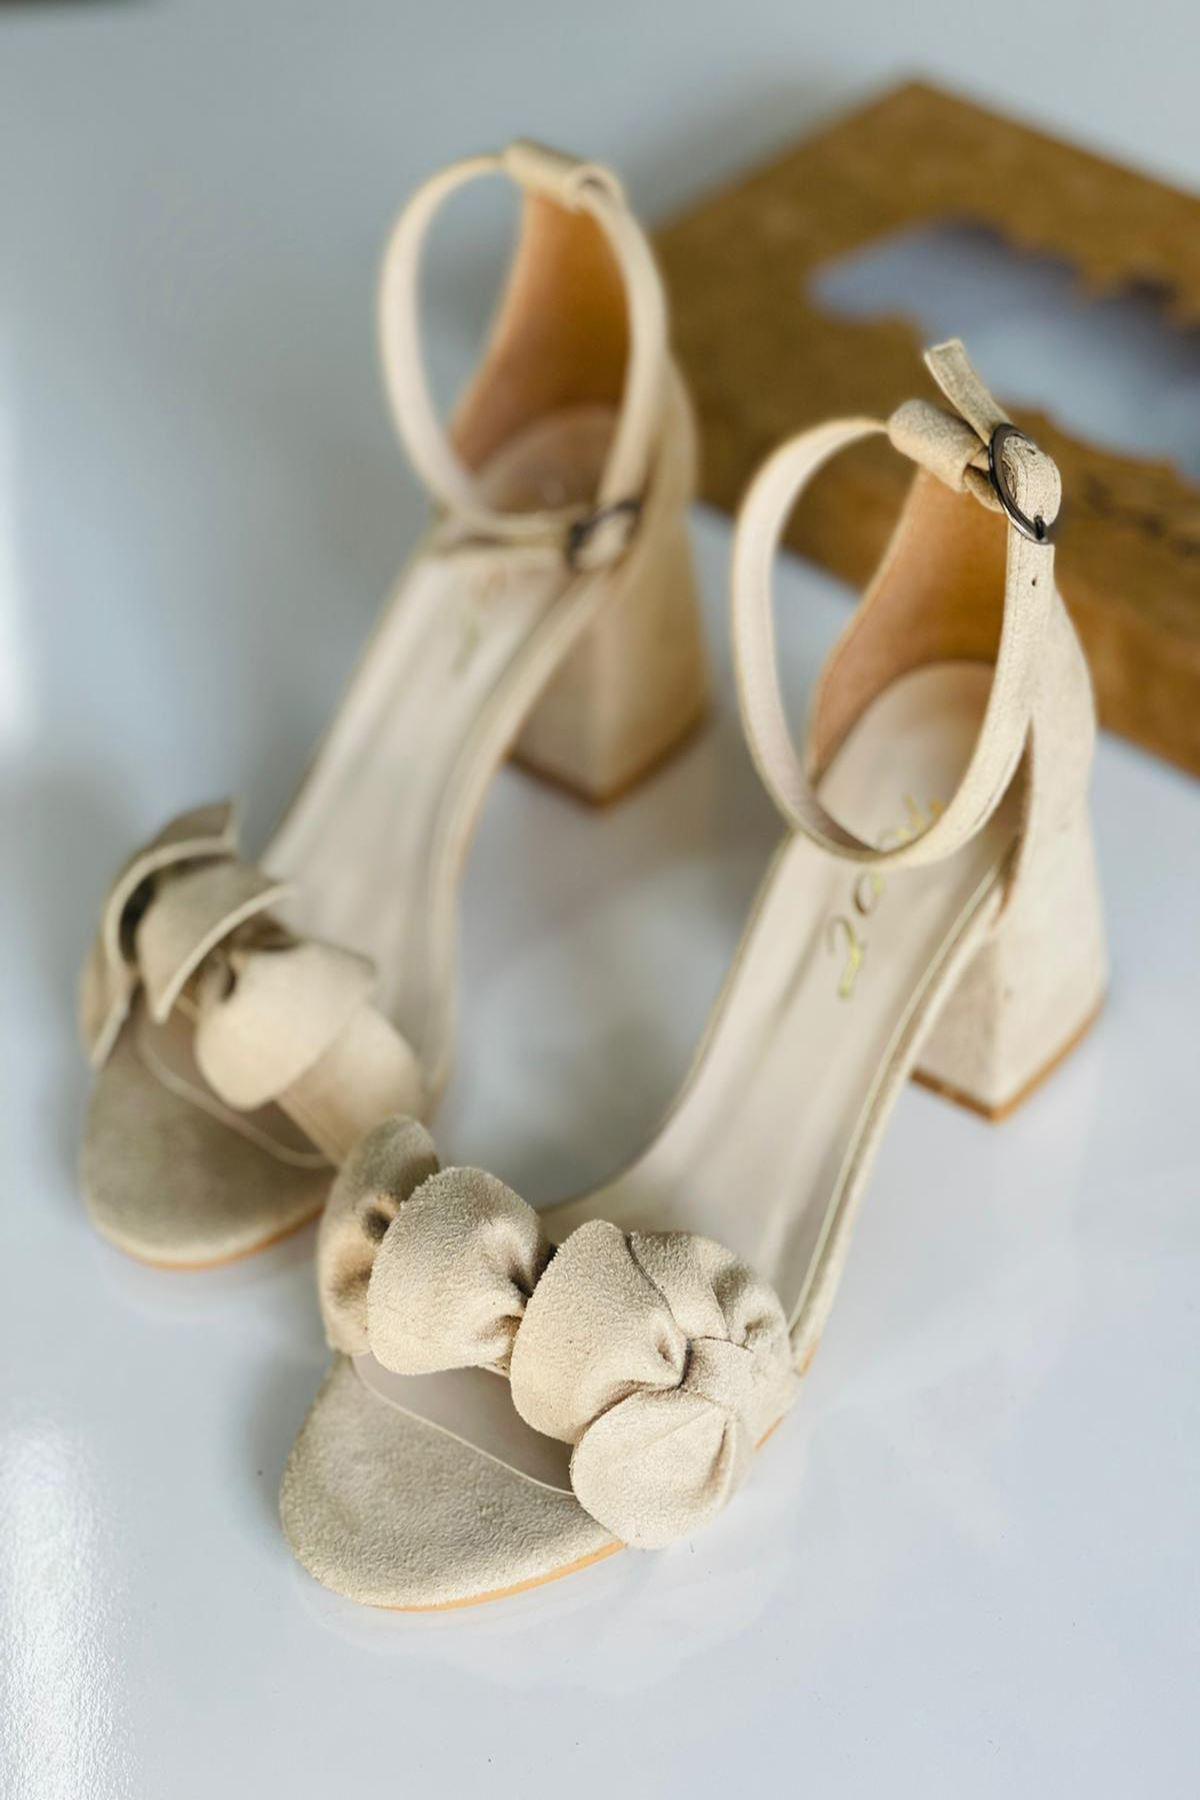 YYNDCC Ten Süet Topuklu Ayakkabı